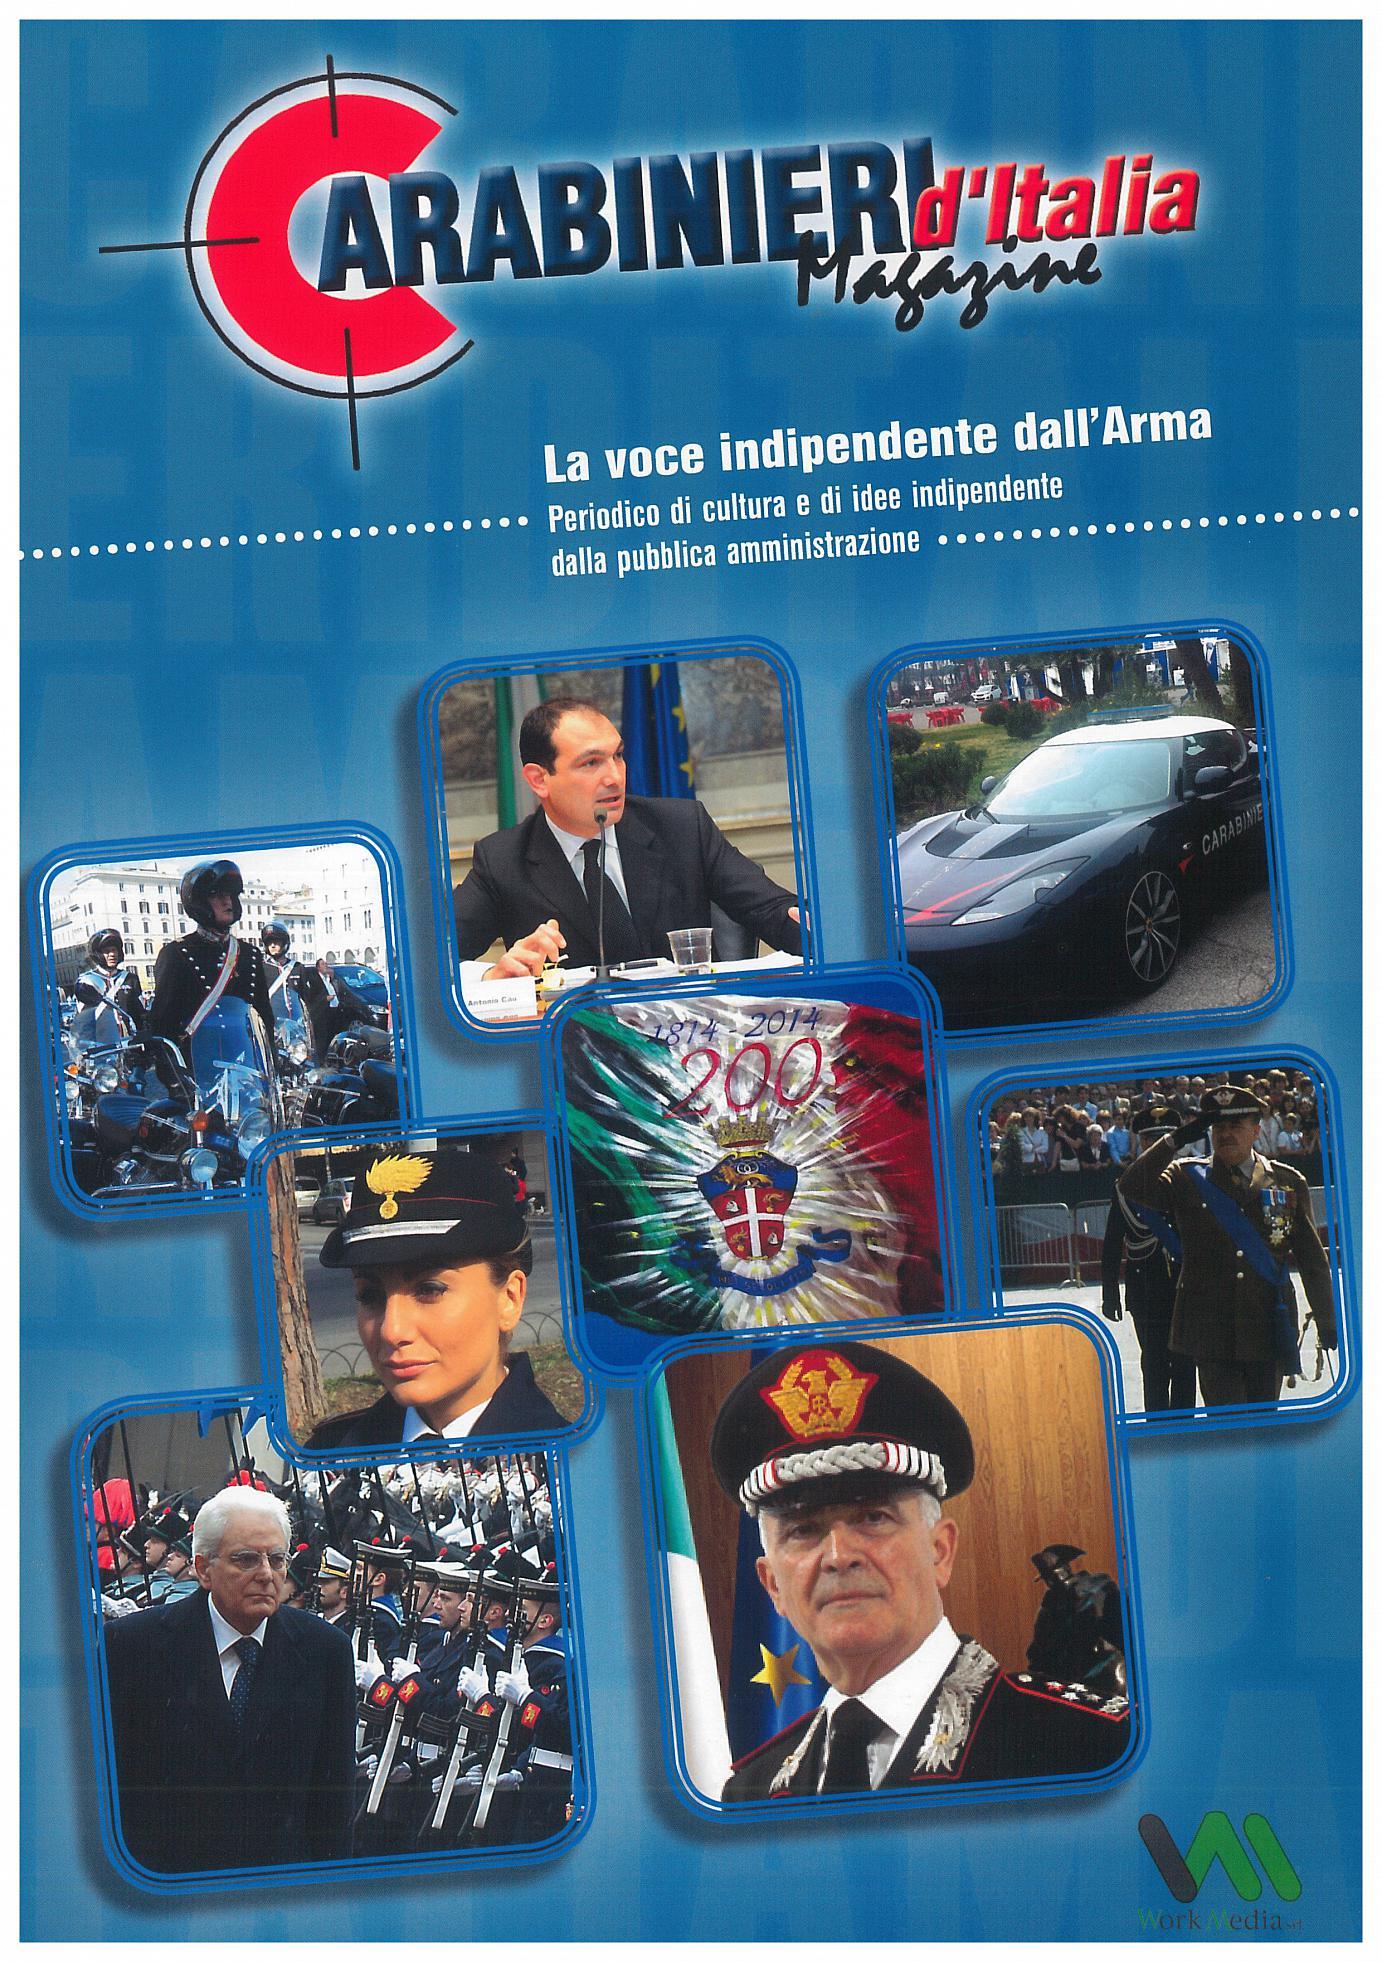 Copertina Carabinieri dItalia Magazine 1-2